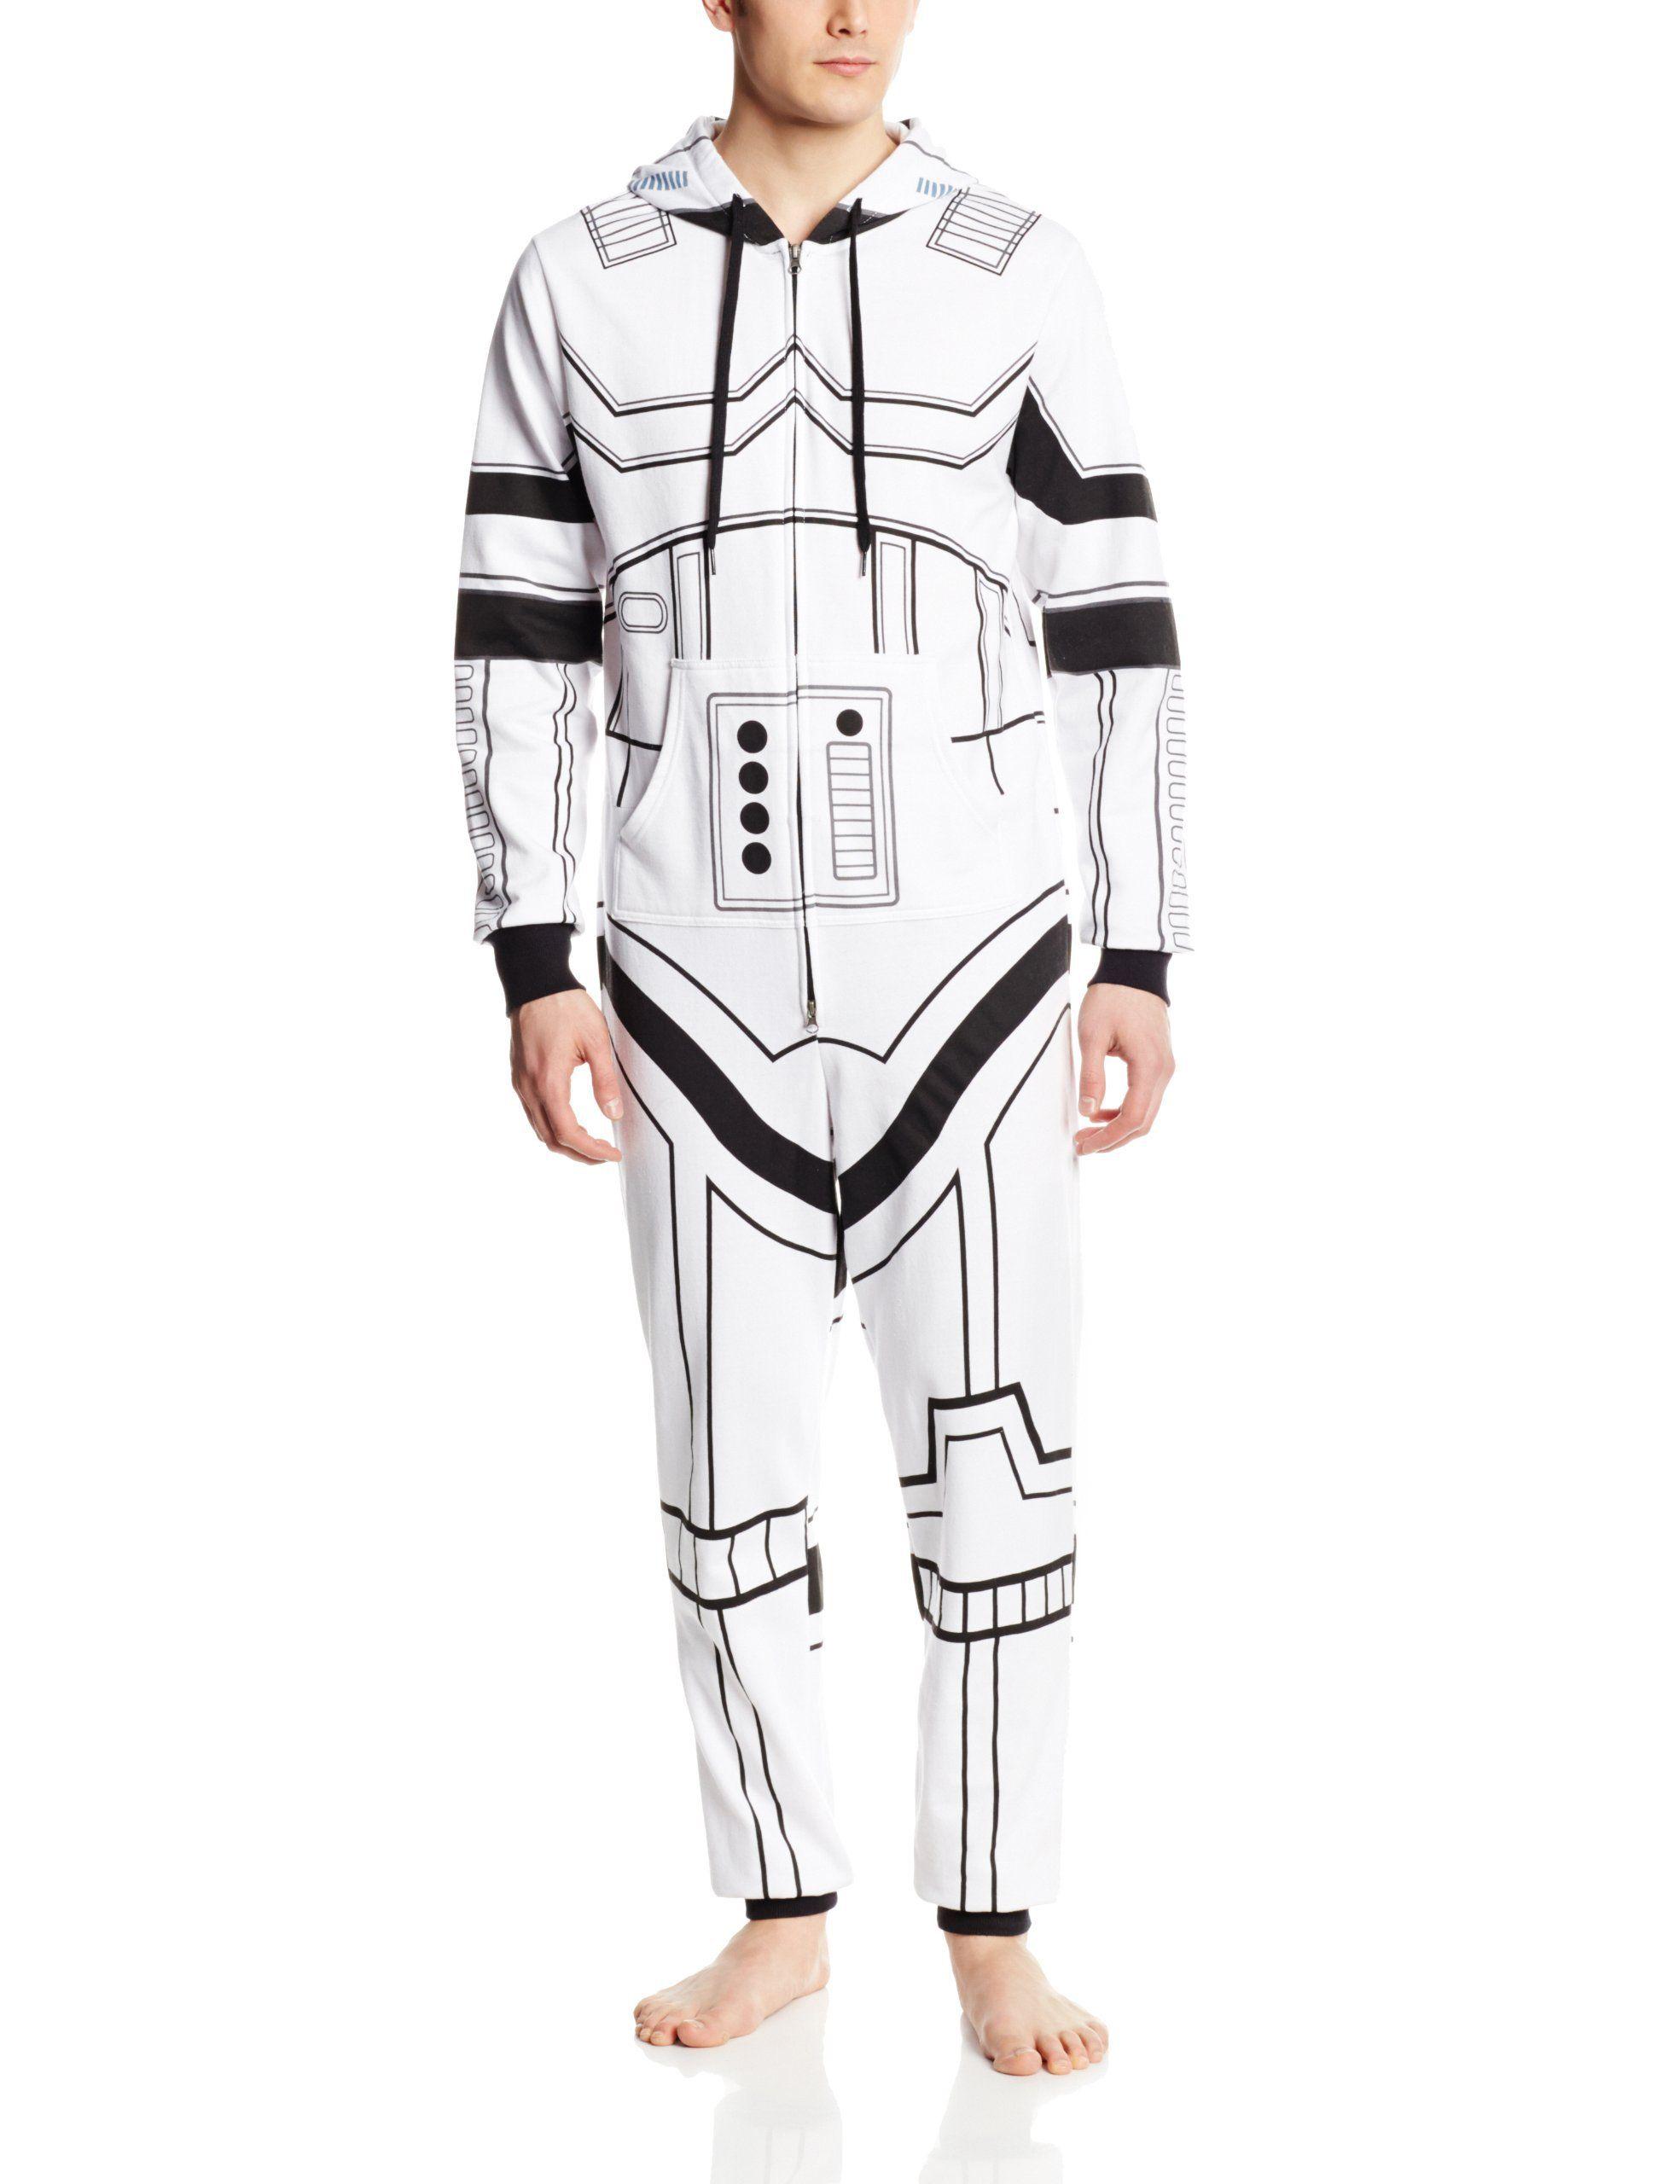 Men's Clothing The Punisher Frank Castle Hoodie Coat Unisex Fleece Skeleton Zipper Jacket Cosplay Costomes Distinctive For Its Traditional Properties